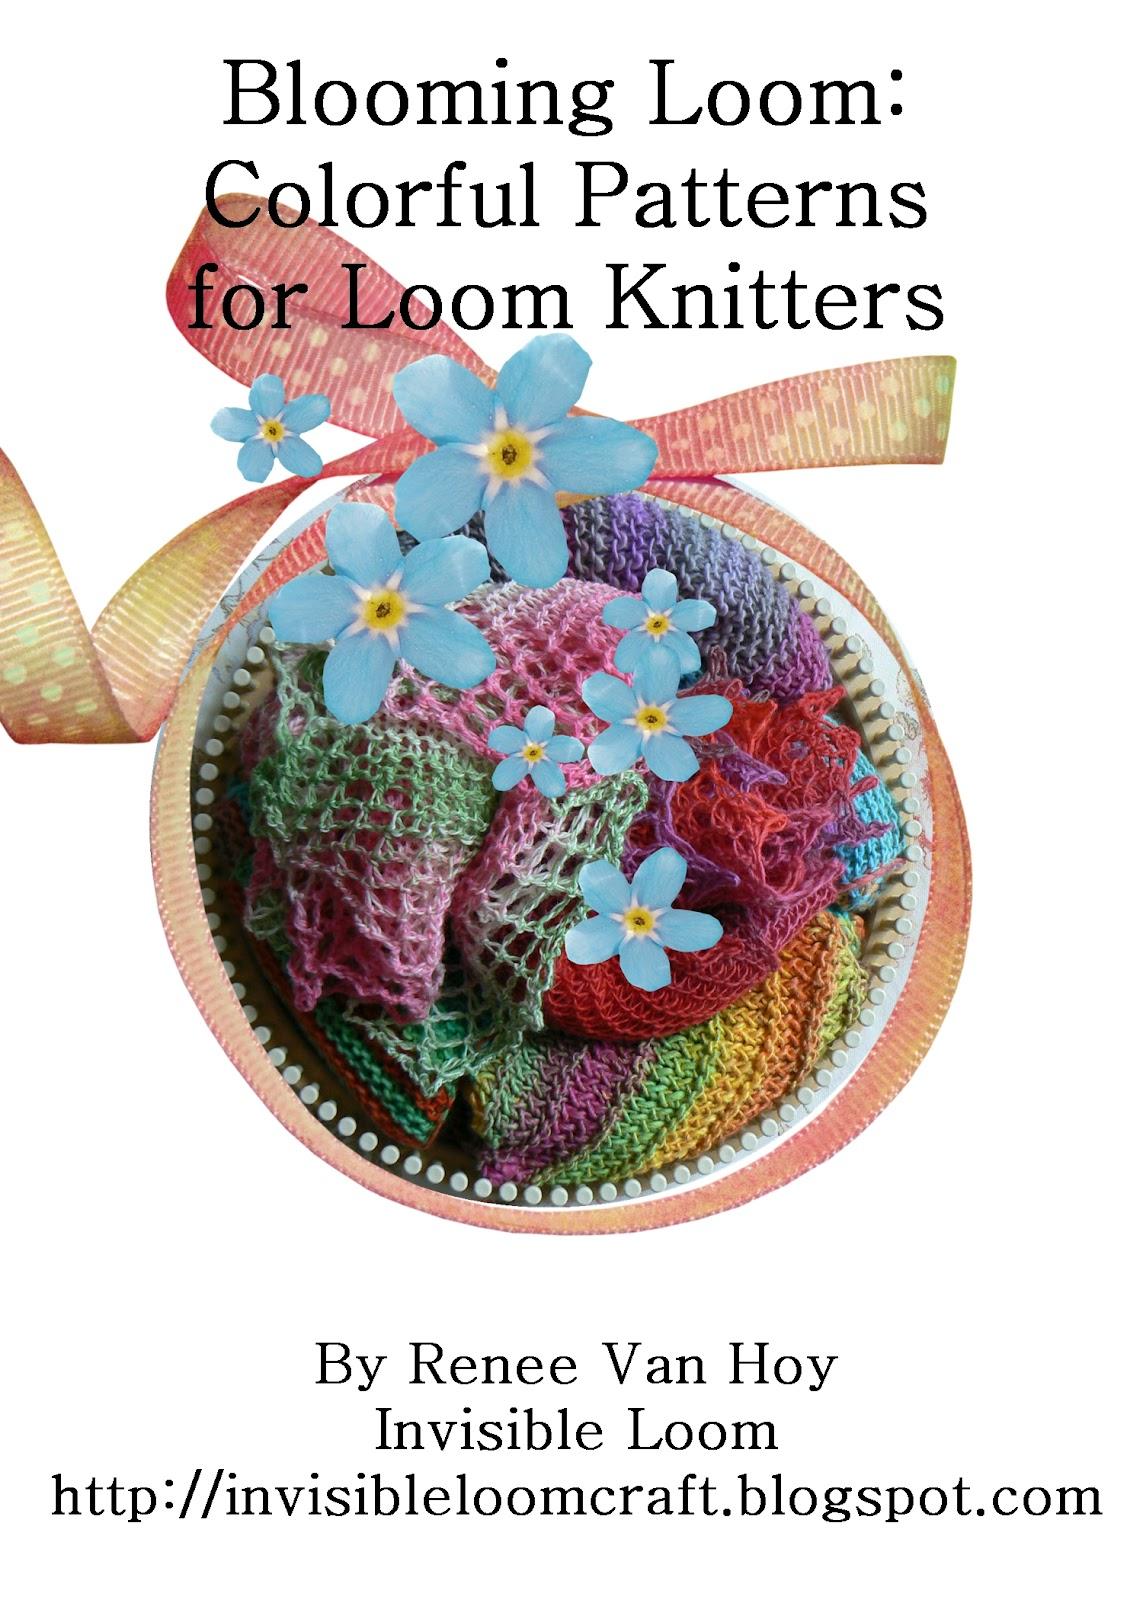 Loom Knitting Pattern Book Download : loom knitting primer and loom knitting pattern book she is ...